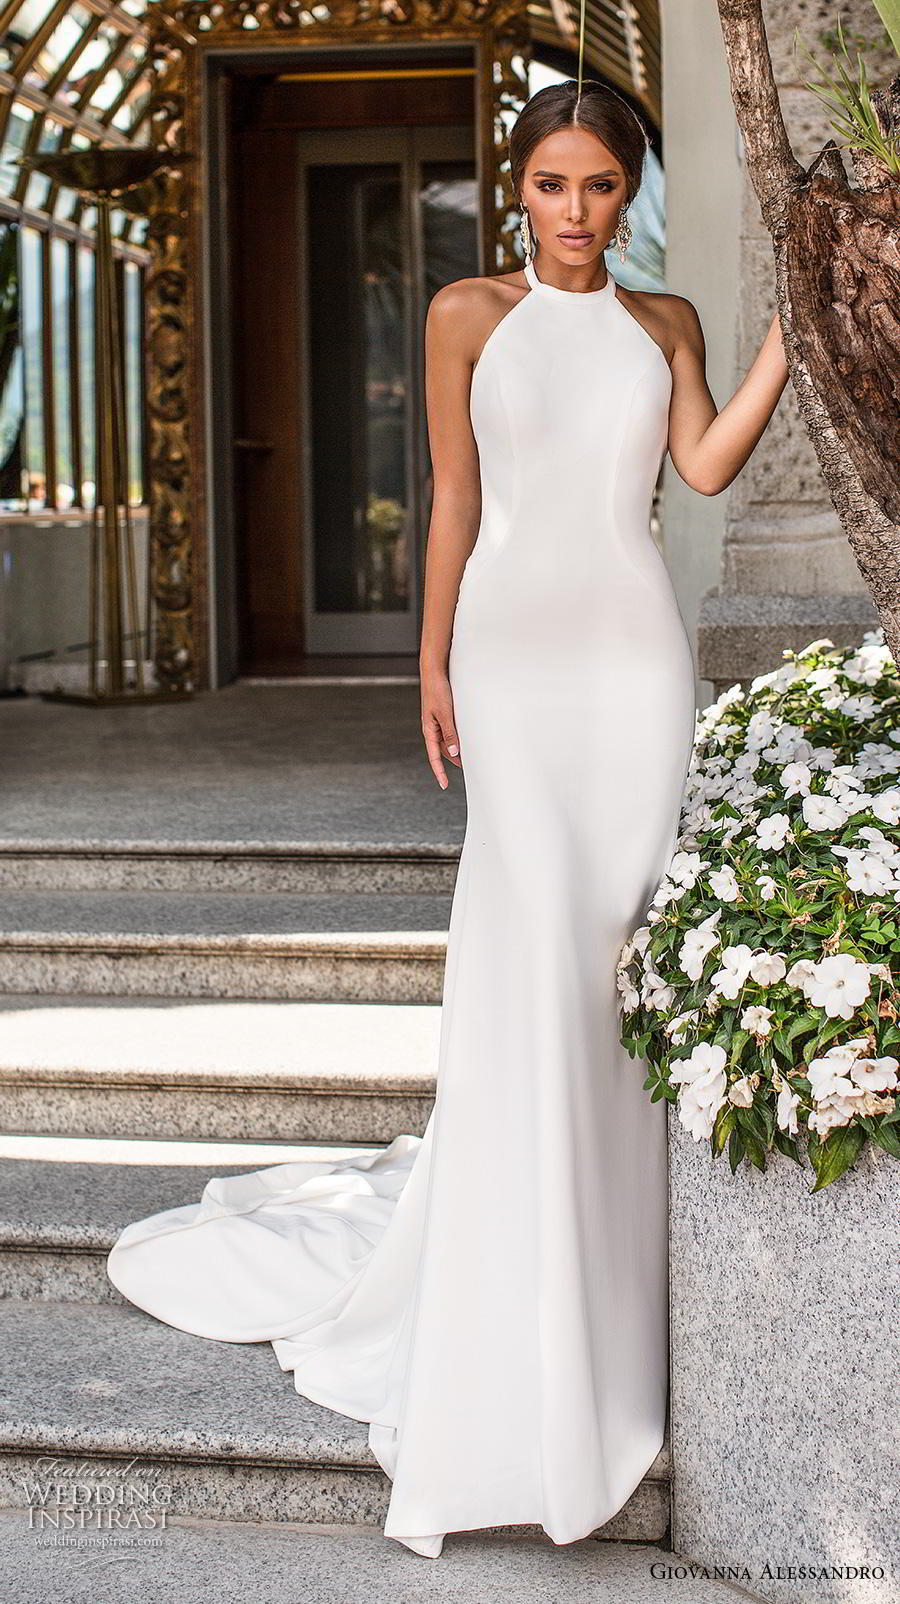 giovanna alessandro 2019 bridal sleeveless halter neck simple minimalist elegant sheath wedding dress backless chapel train (6) mv